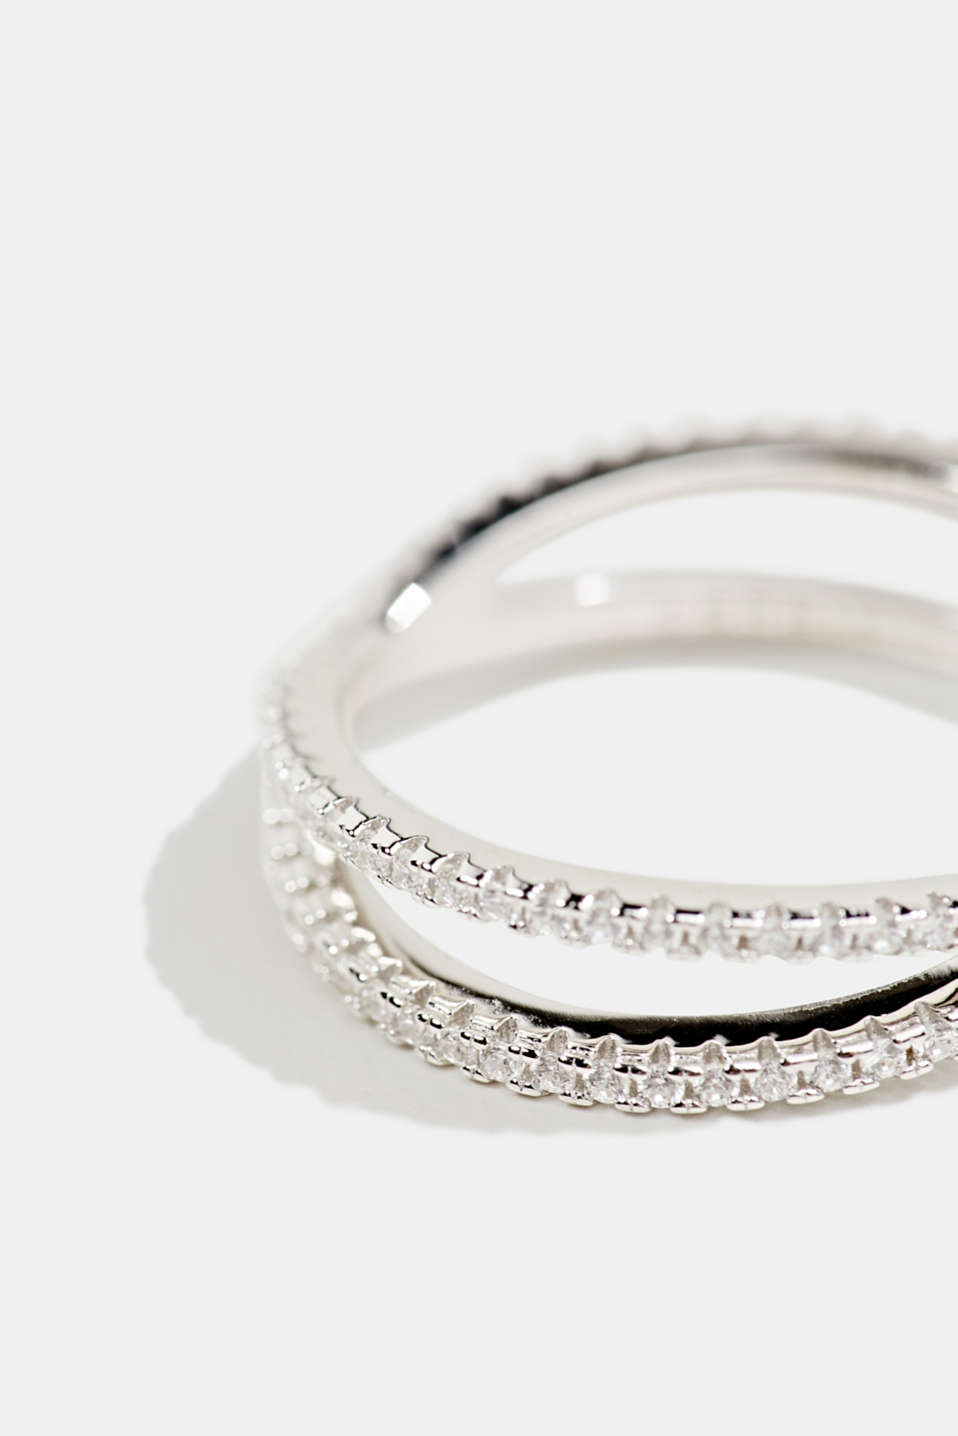 Silver ring, LCSILVER, detail image number 1